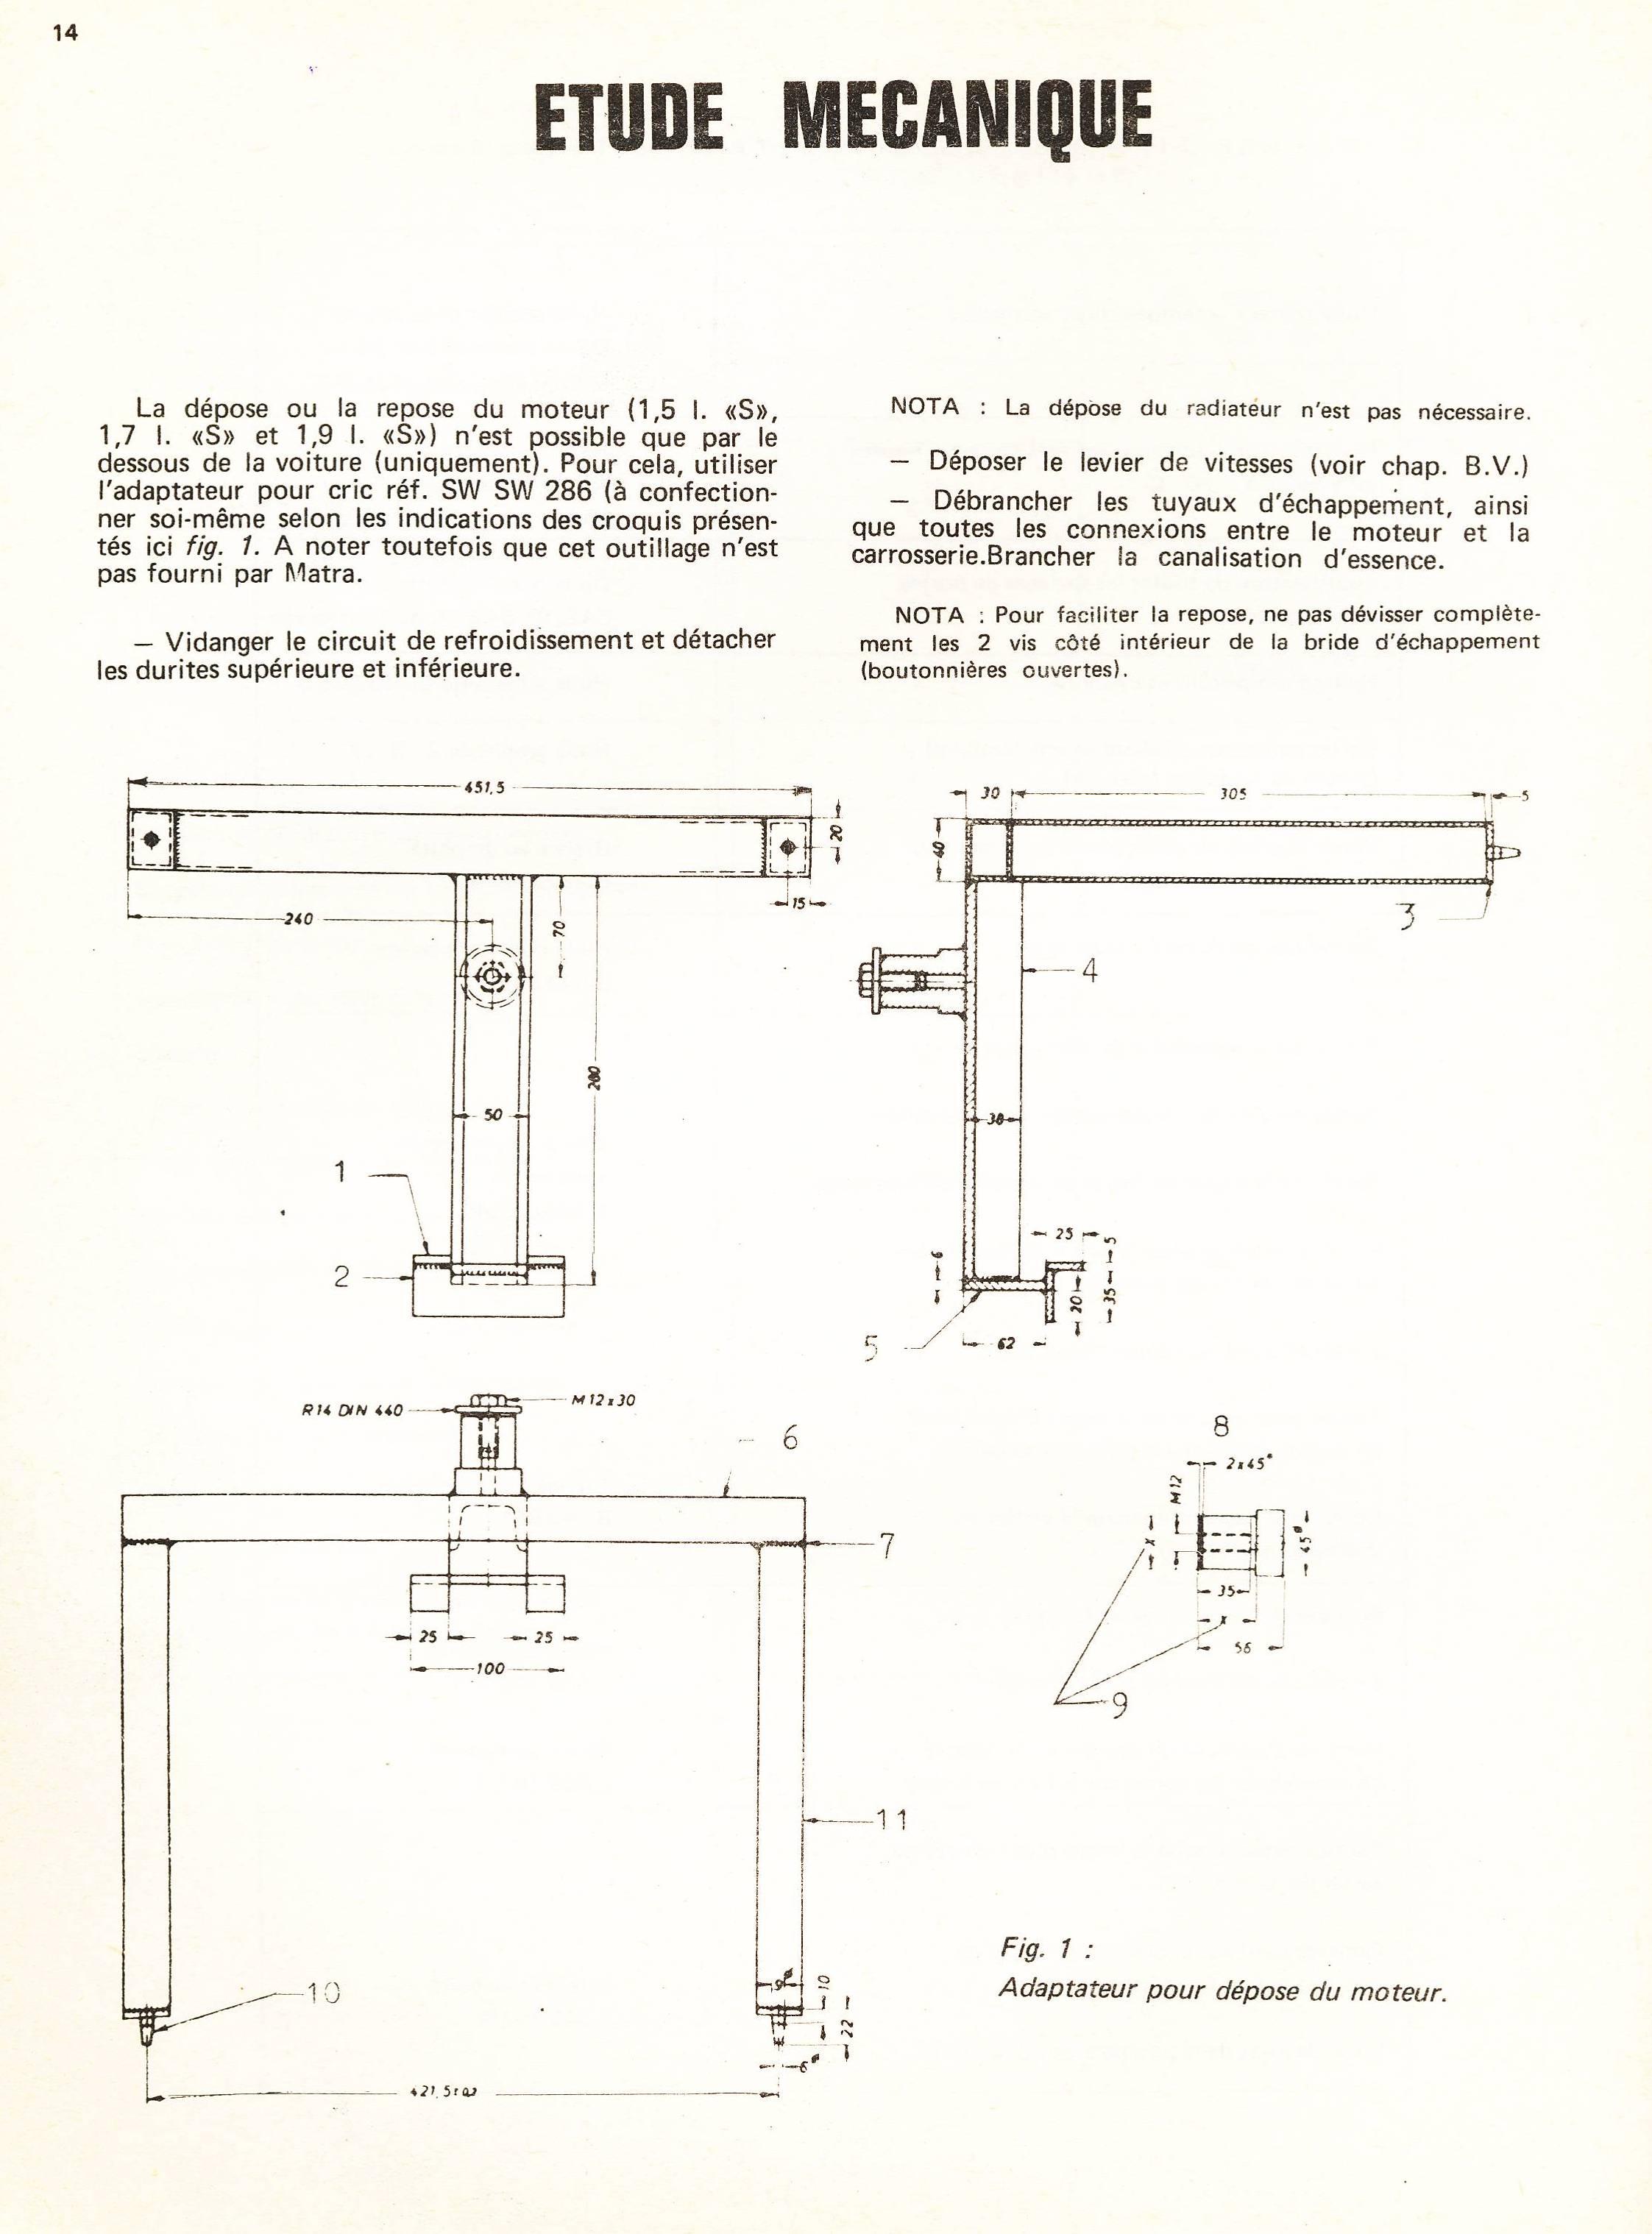 Moteur Cih 1900 1500 1700 Opel Kadett B Wiring Diagram